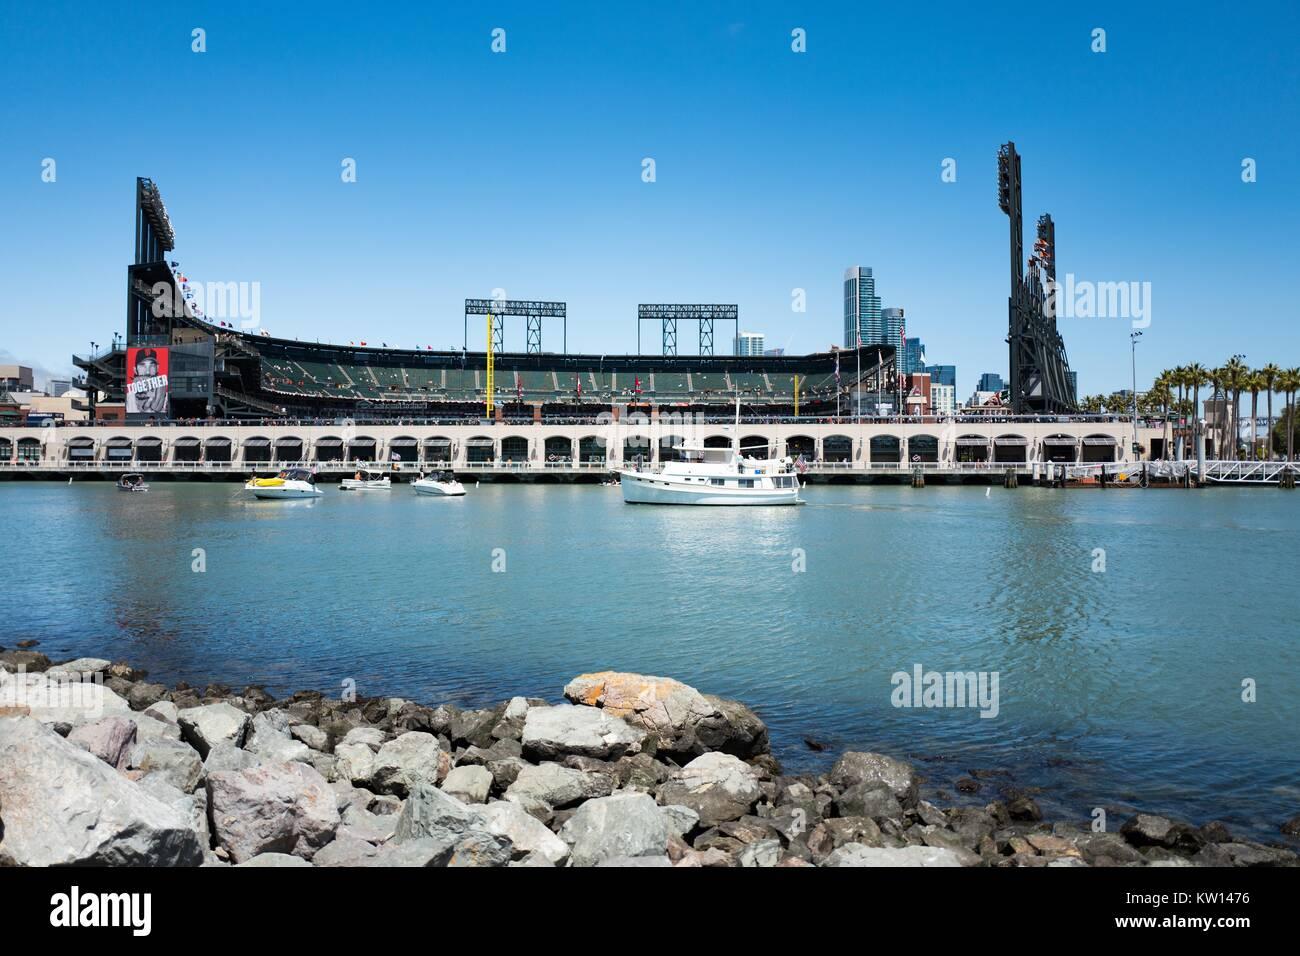 San Francisco Giants Stockfotos & San Francisco Giants Bilder - Alamy